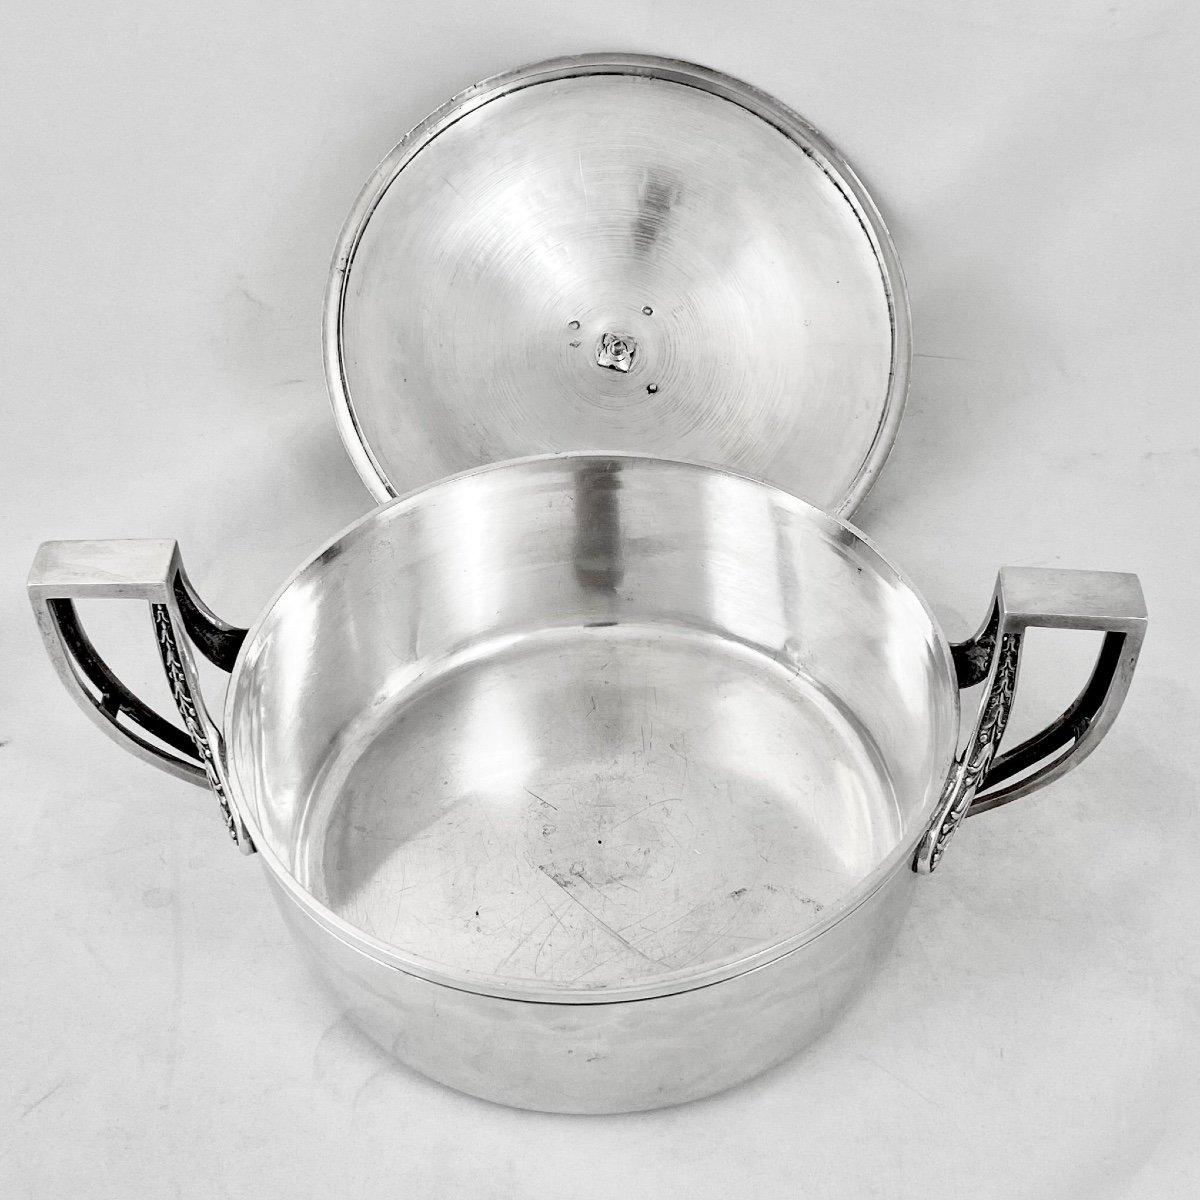 Sterling Silver Vegetable Dish, Empire Period, Paris 1809-1819, J.-b. Lefranc-photo-4